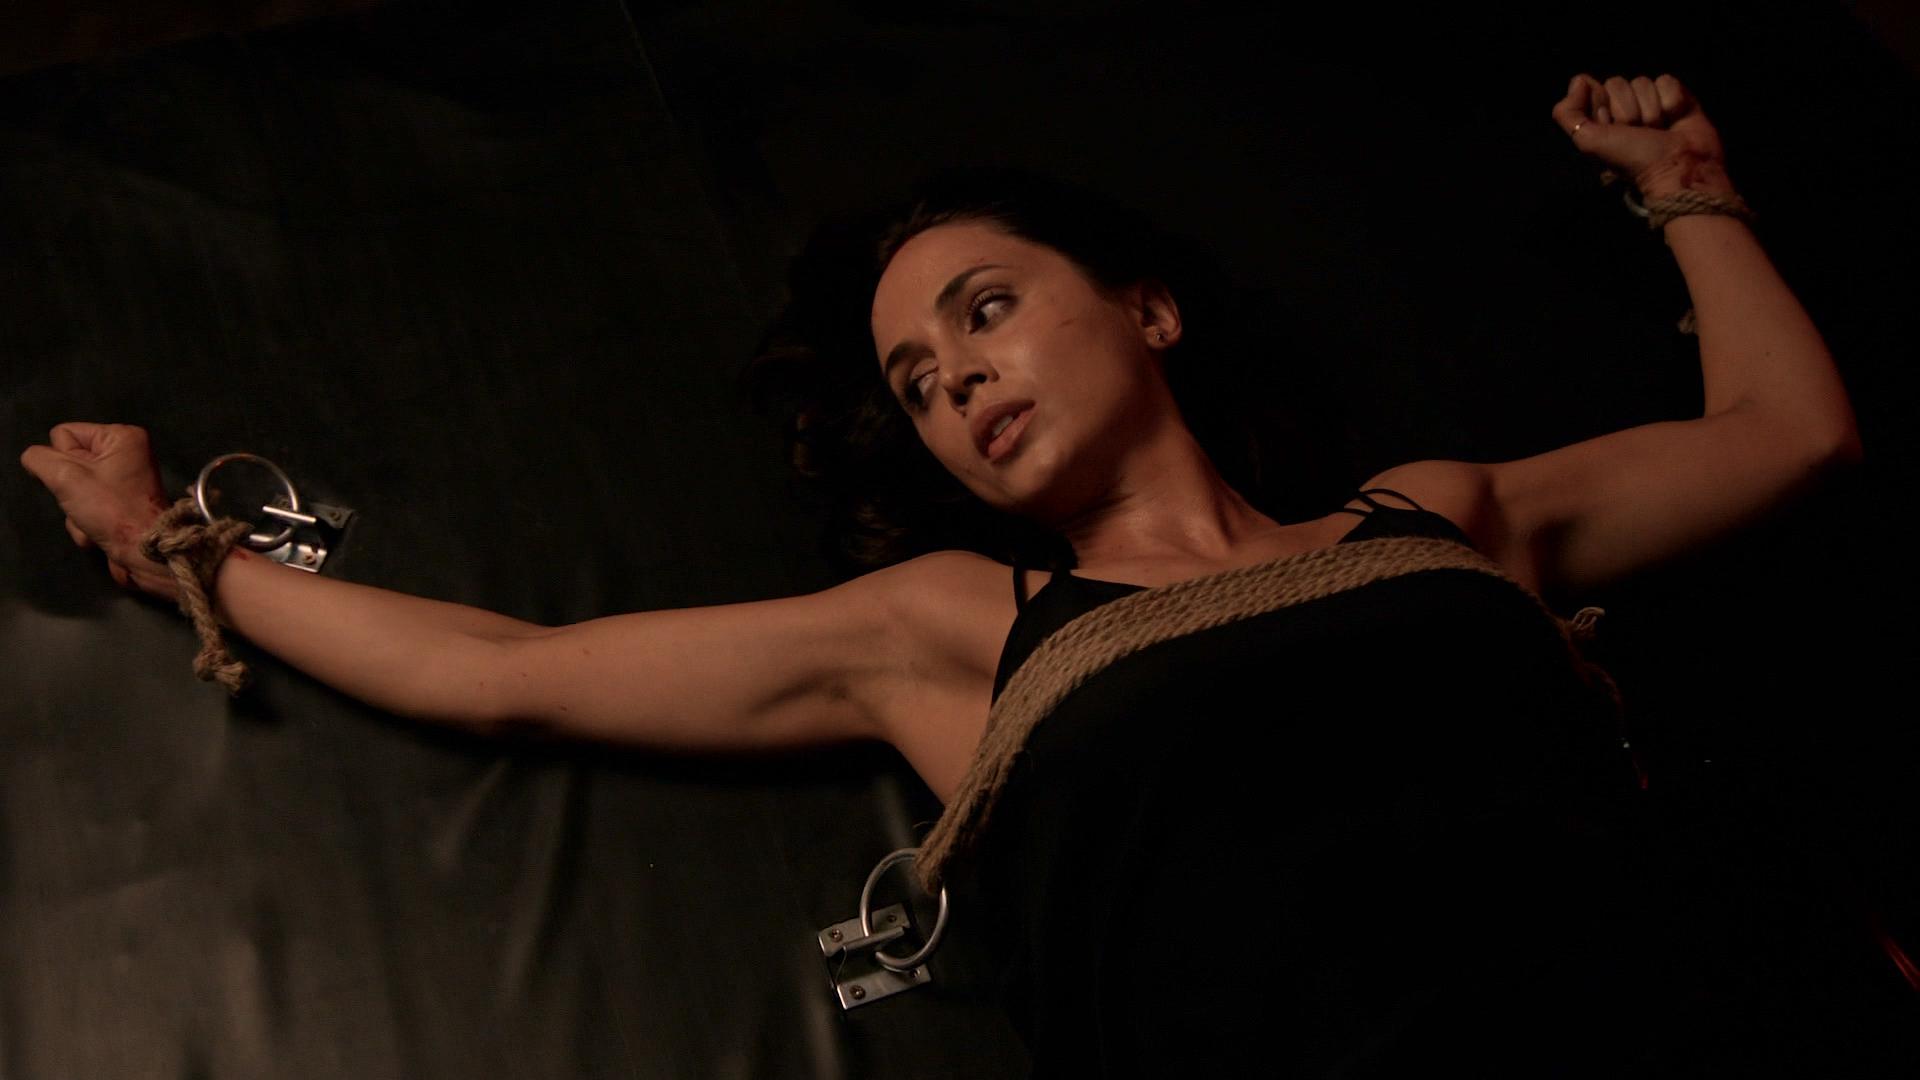 Ana Ayora Nude eliza dushku hot and bound and ana ayora nude topless in